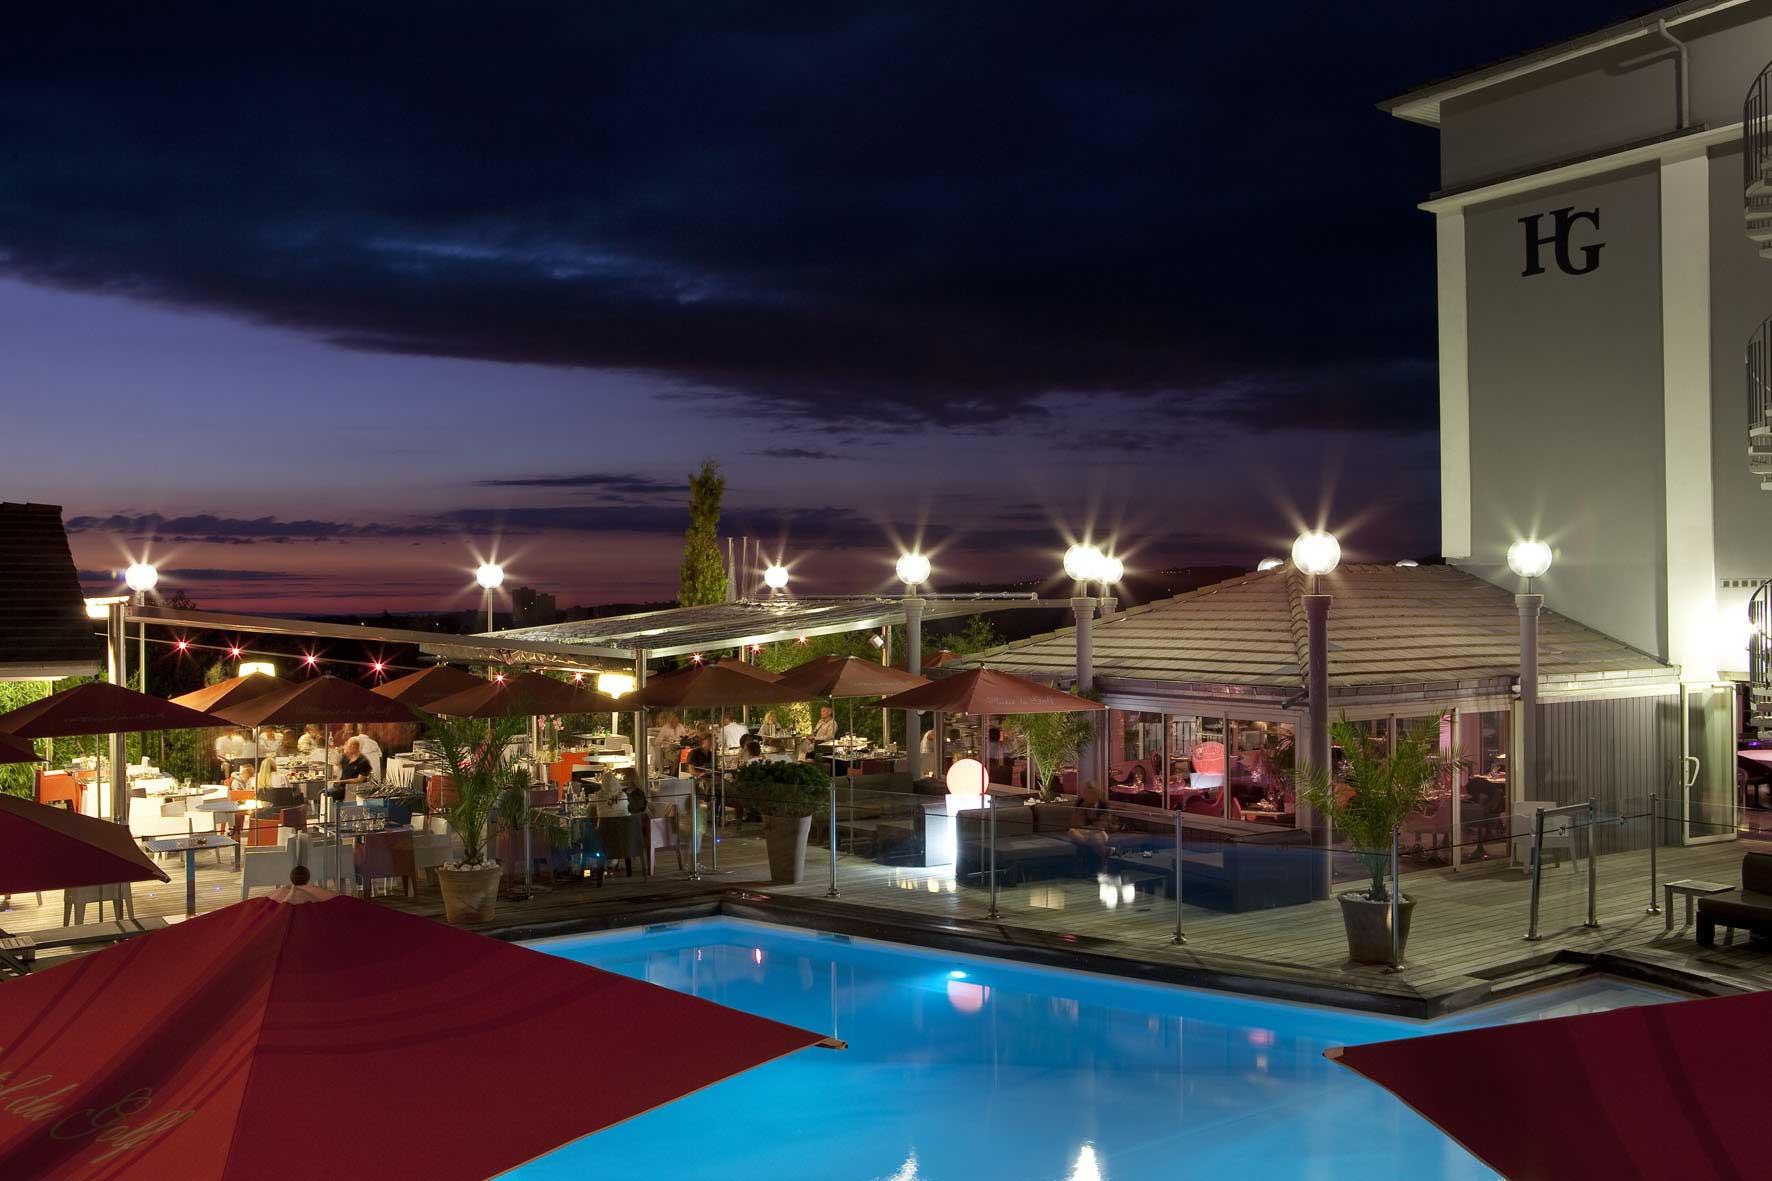 rbconcept-hotel-du-golf-terrasse-ete-nuit